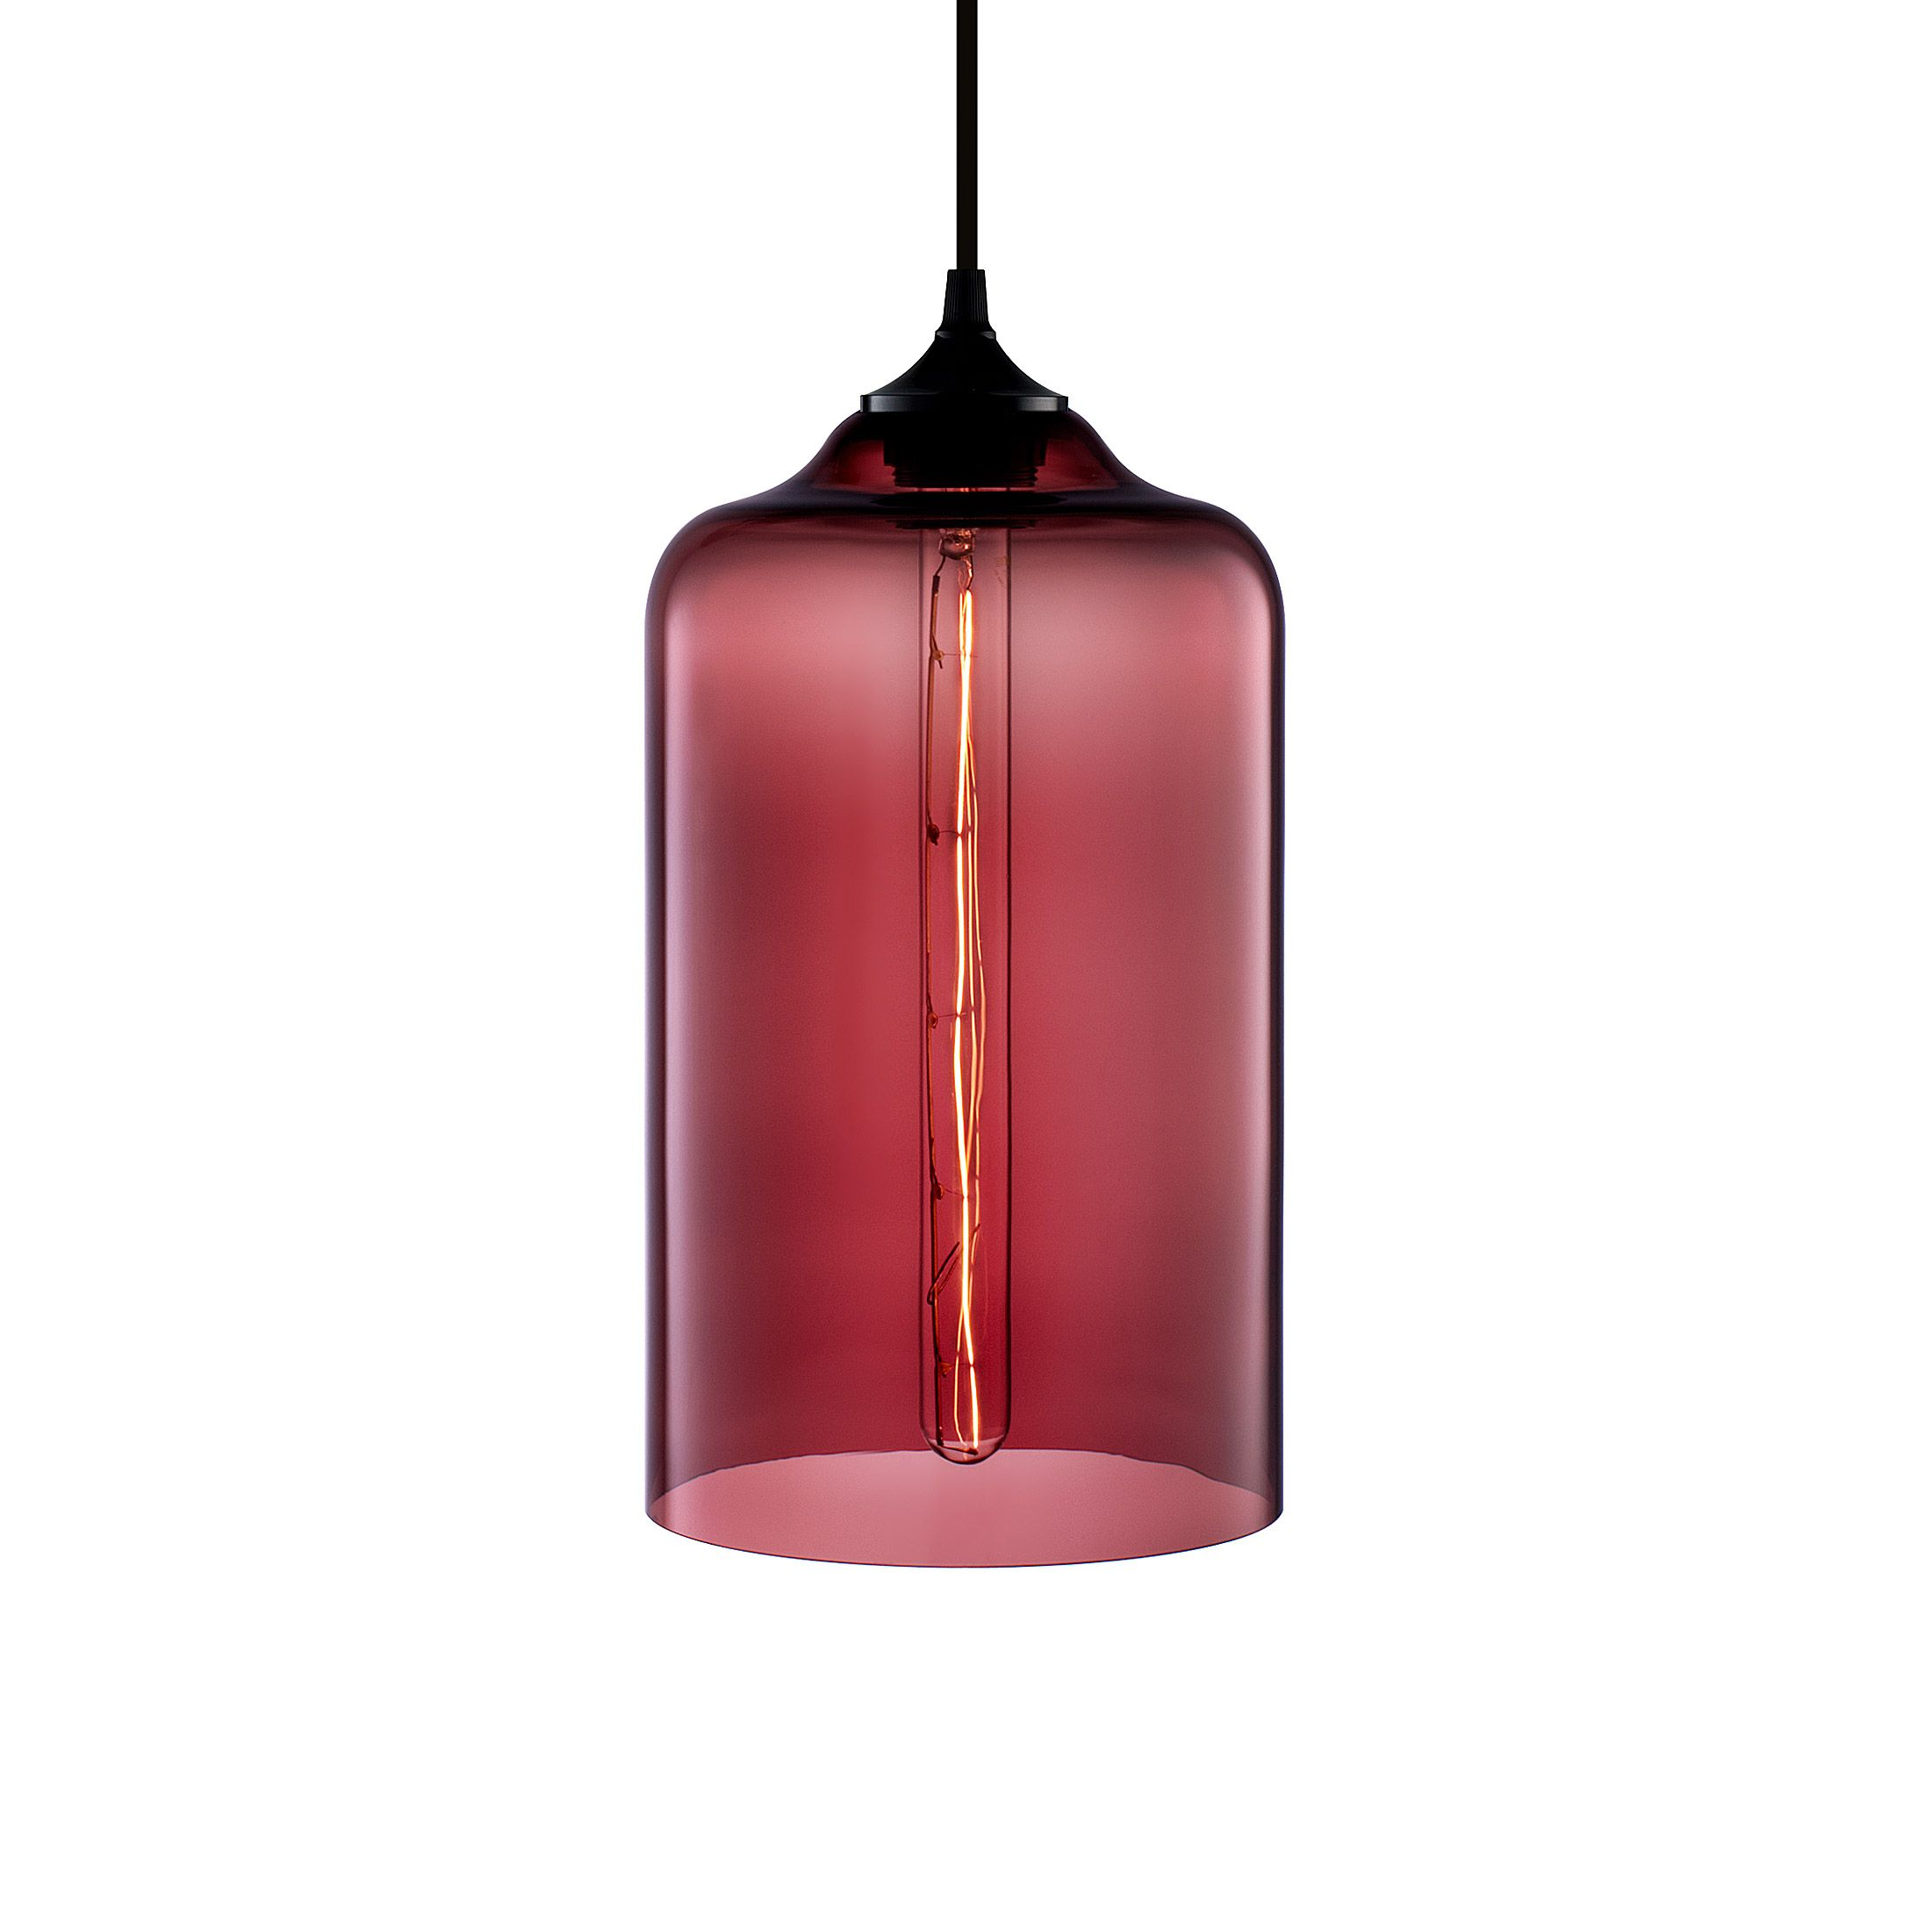 Bella Modern Pendant Light In Plum Modernlight Modern Pendant Light Niche Modern Pendant Lighting Collections